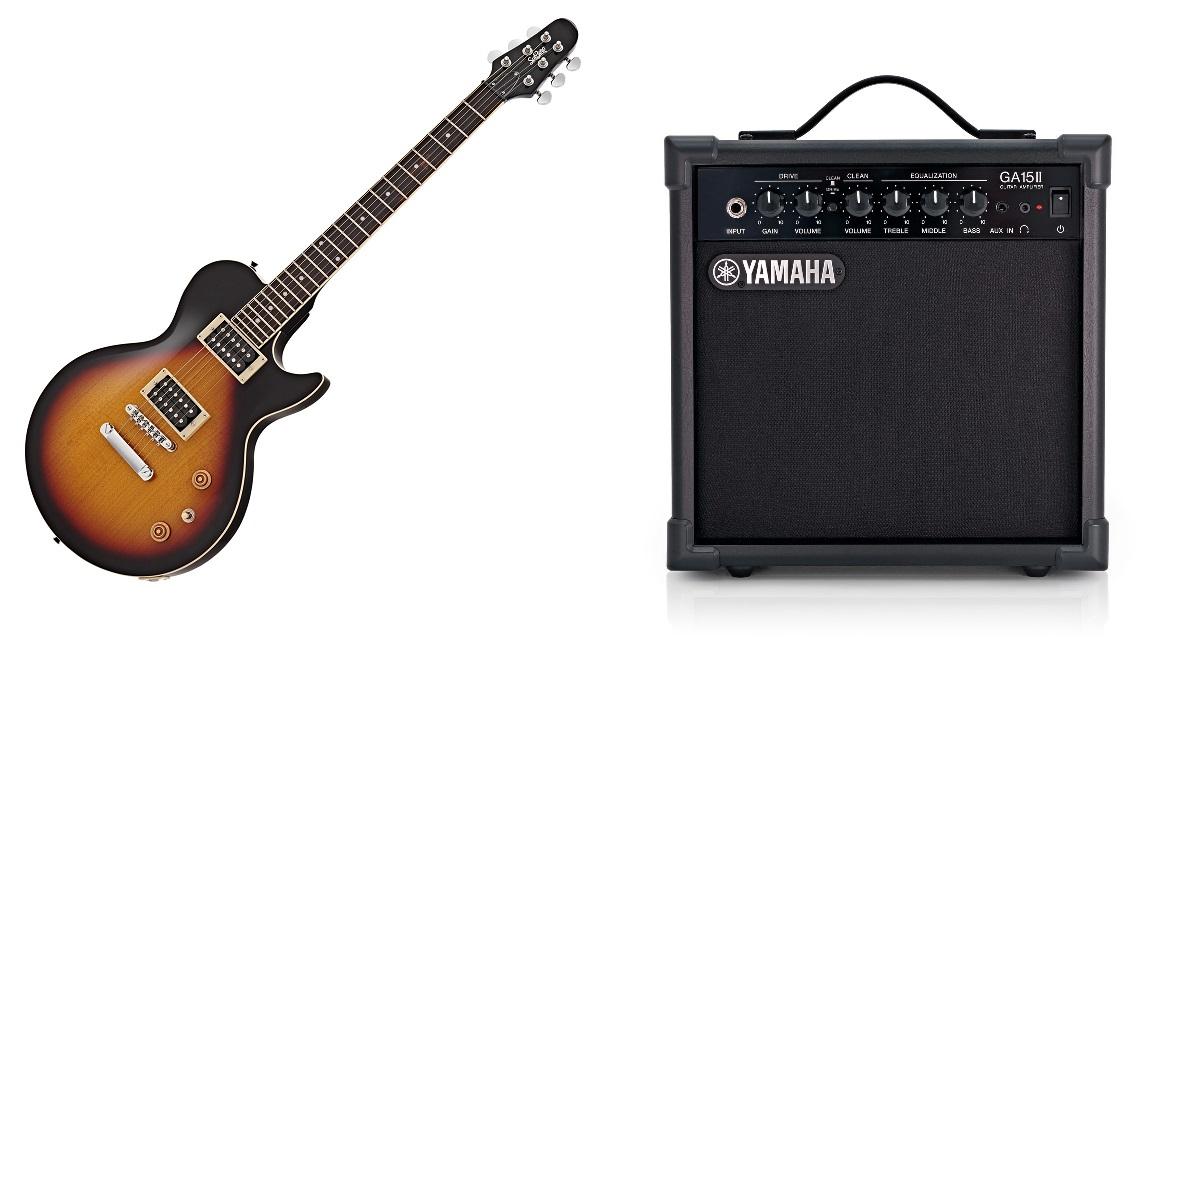 *Gear4music Clearance* SubZero Vintage Sunburst Electric Guitar W/ Yamaha 15w Amp Delivered £155.96 @ Gear4music